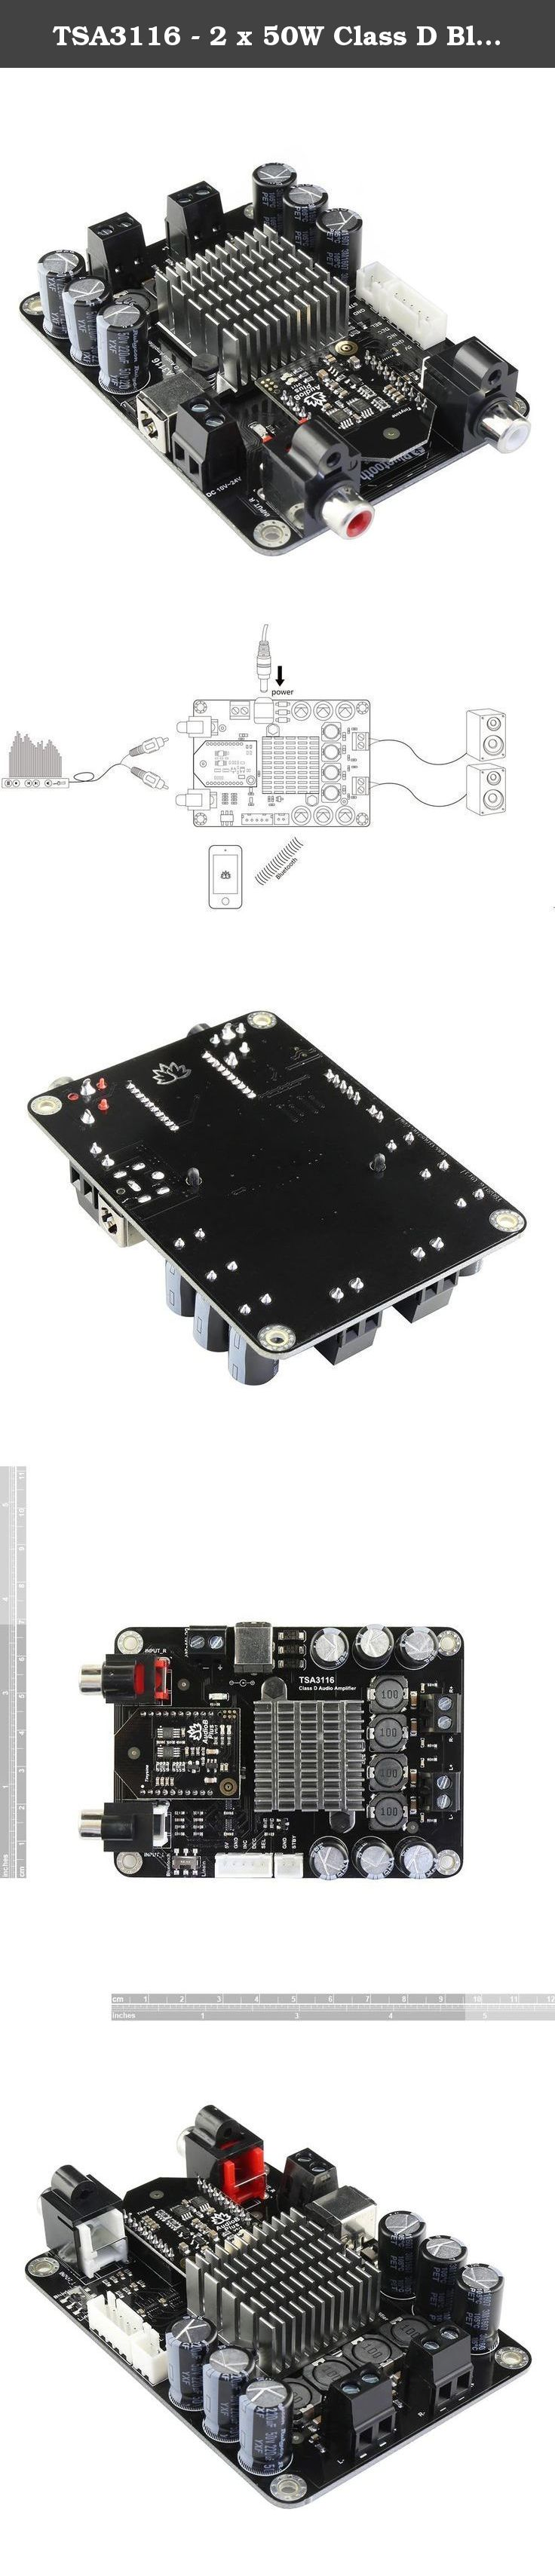 Tsa3116 2 X 50w Class D Bluetooth Audio Amplifier Board With Tda1514a Descriptions This Is